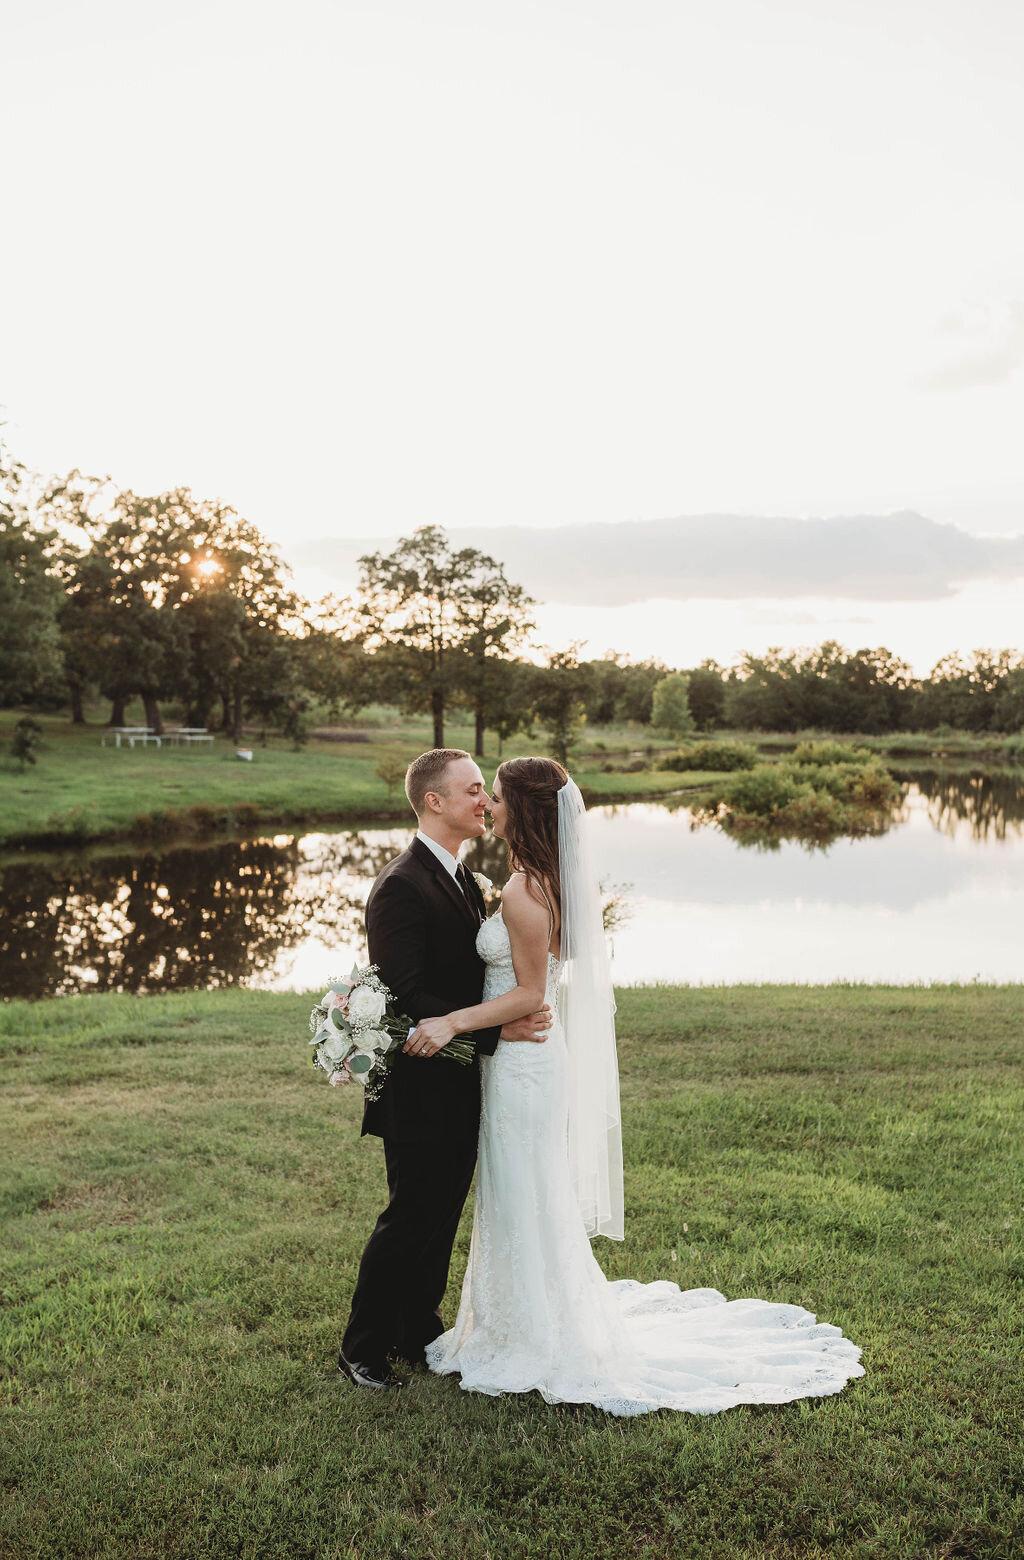 Tulsa Wedding Venue with a View 41.jpg